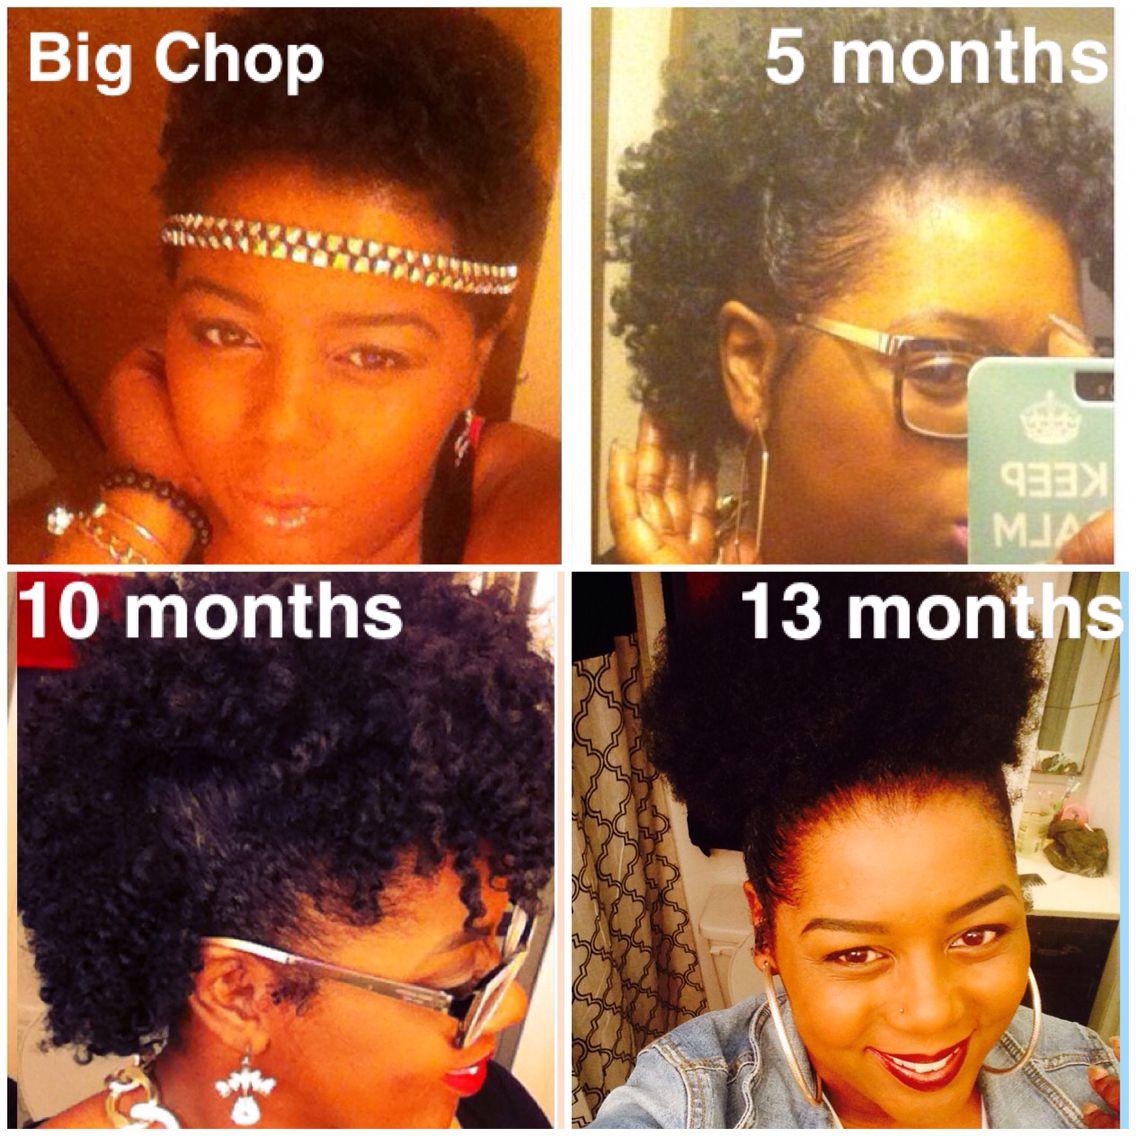 My Natural Hair Journey 13 Months Post Big Chop Natural Hair Hair Growth Inspiration Motiva Big Chop Natural Hair Natural Hair Styles Natural Hair Journey